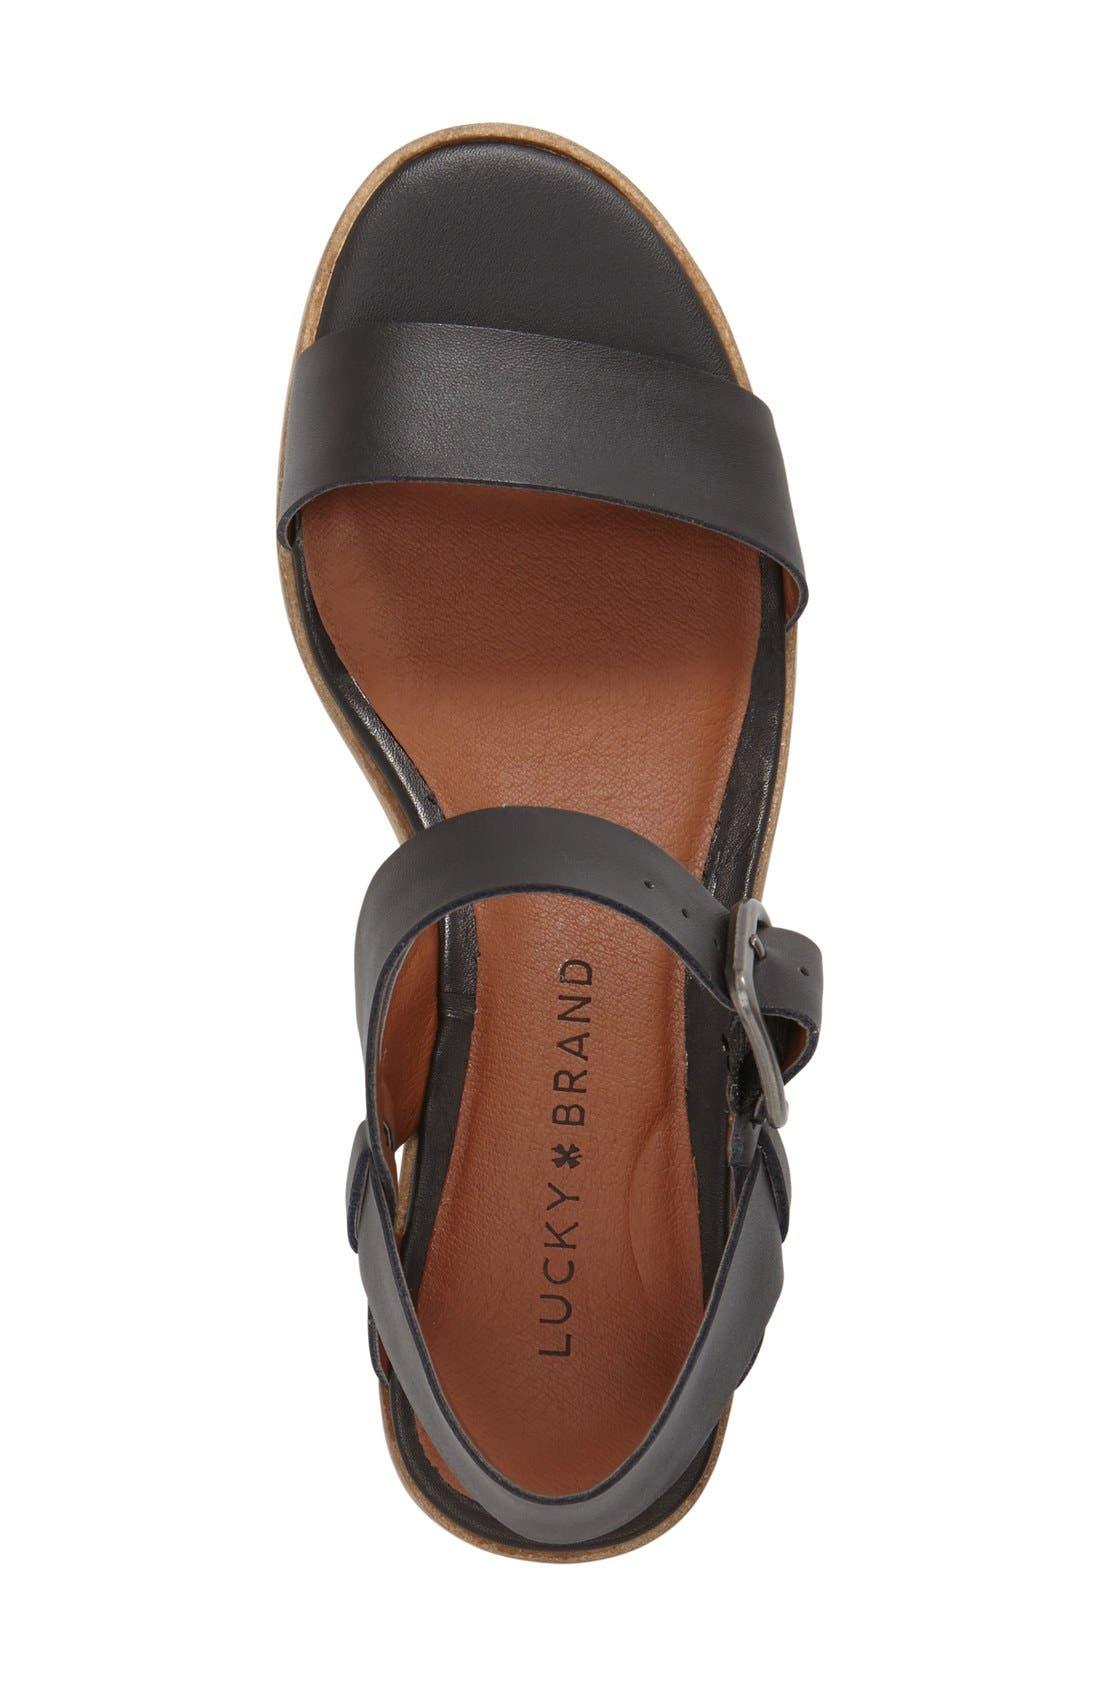 Alternate Image 3  - Lucky Brand 'Toni' Stacked Heel Sandal (Women)